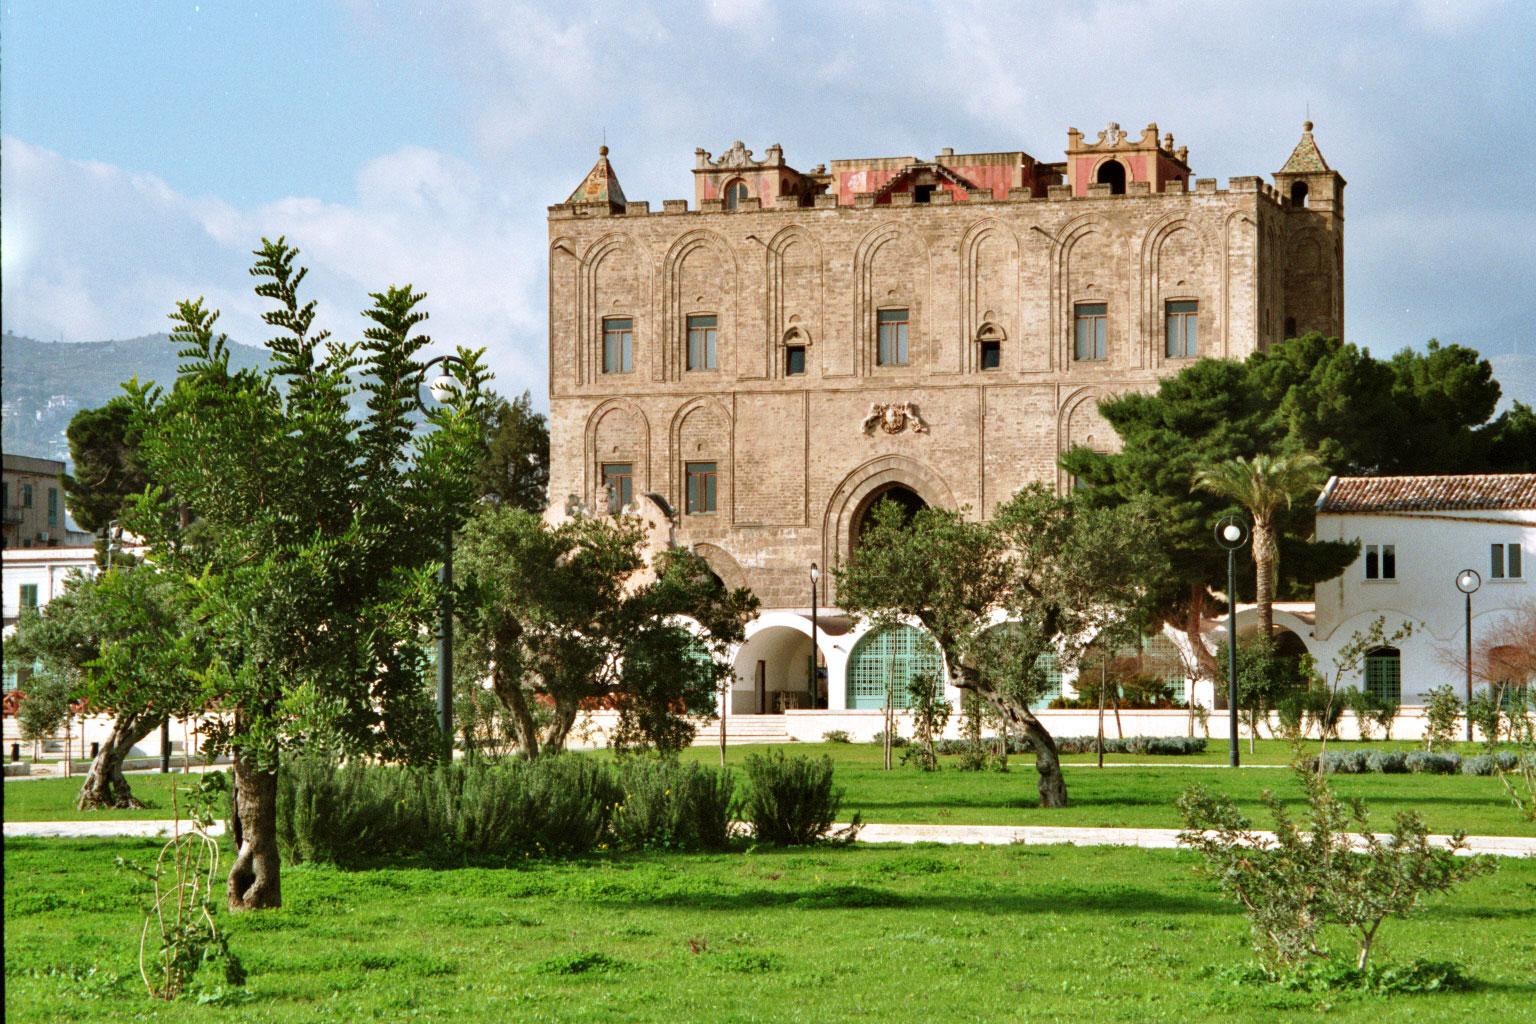 Palermo-Zisa- Sicilia on the road GetCOO Easyterra